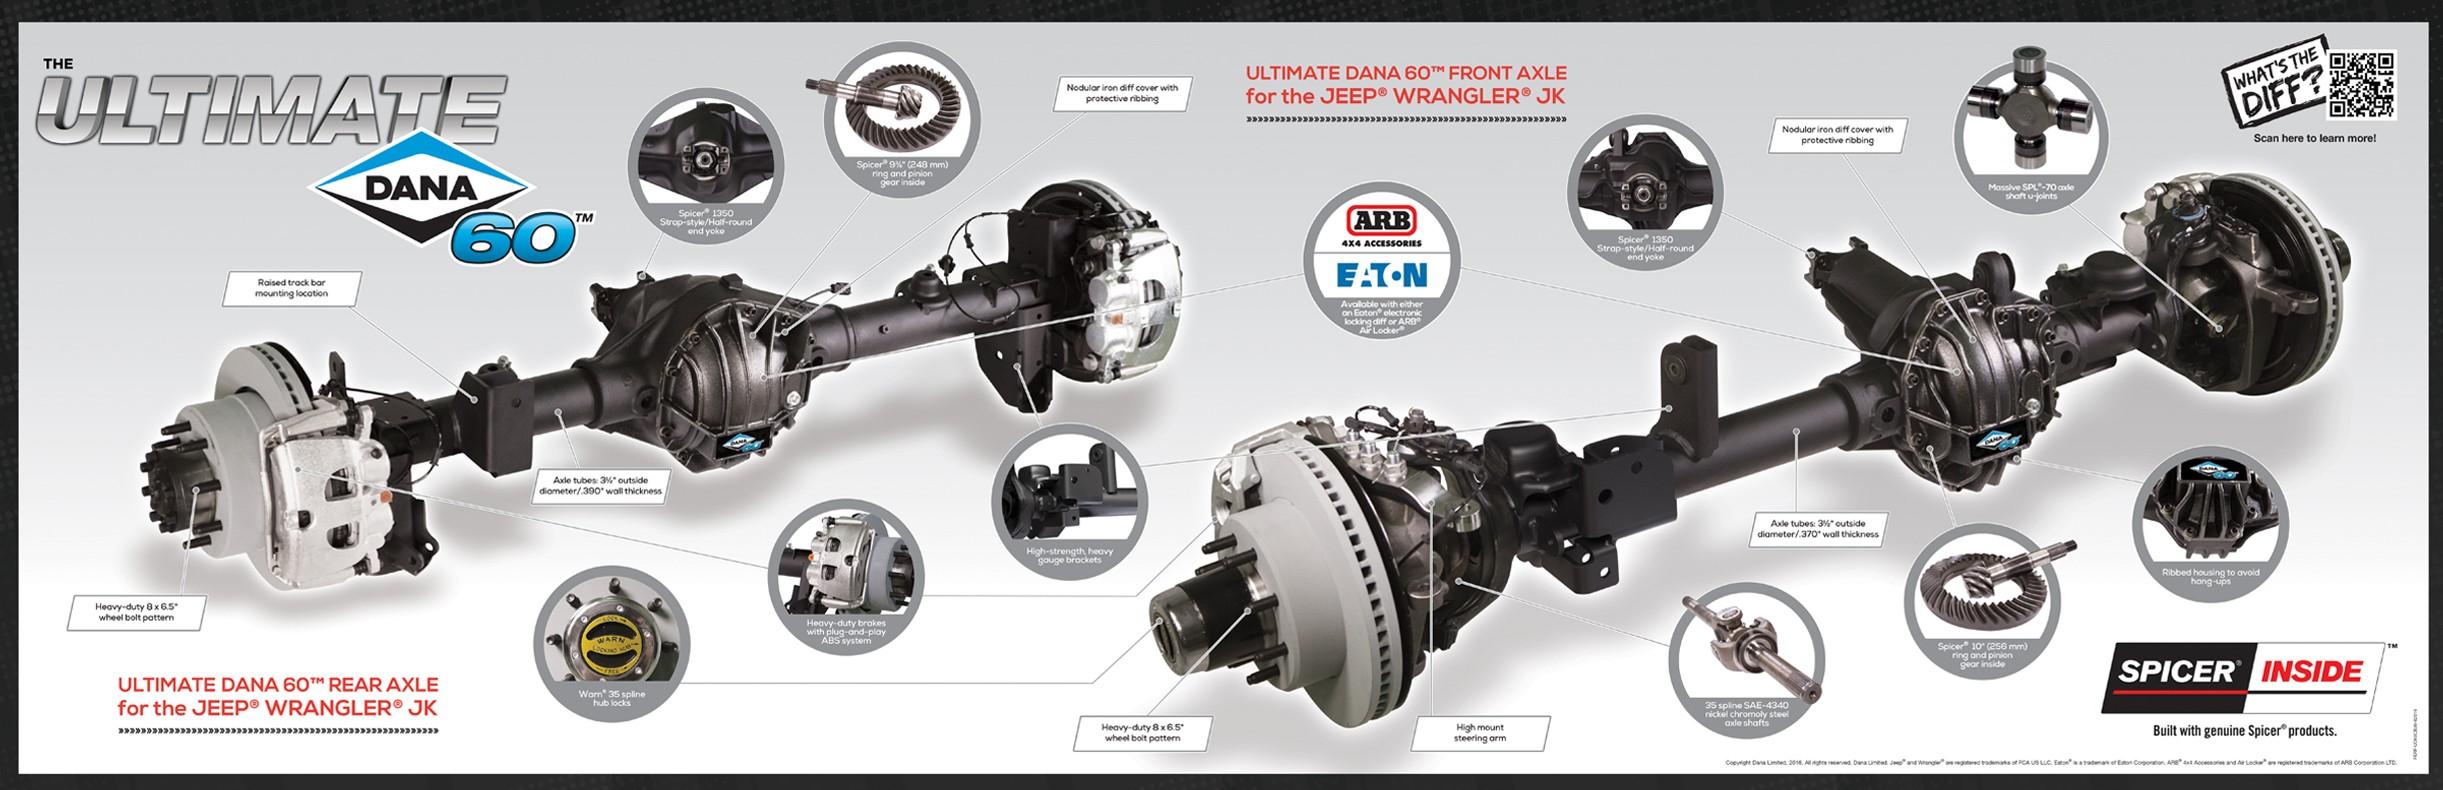 Dana 60 Front Axle Parts Diagram Ultimate Dana 60™ Front Axle for the Jeep Wrangler Jk Axle Of Dana 60 Front Axle Parts Diagram